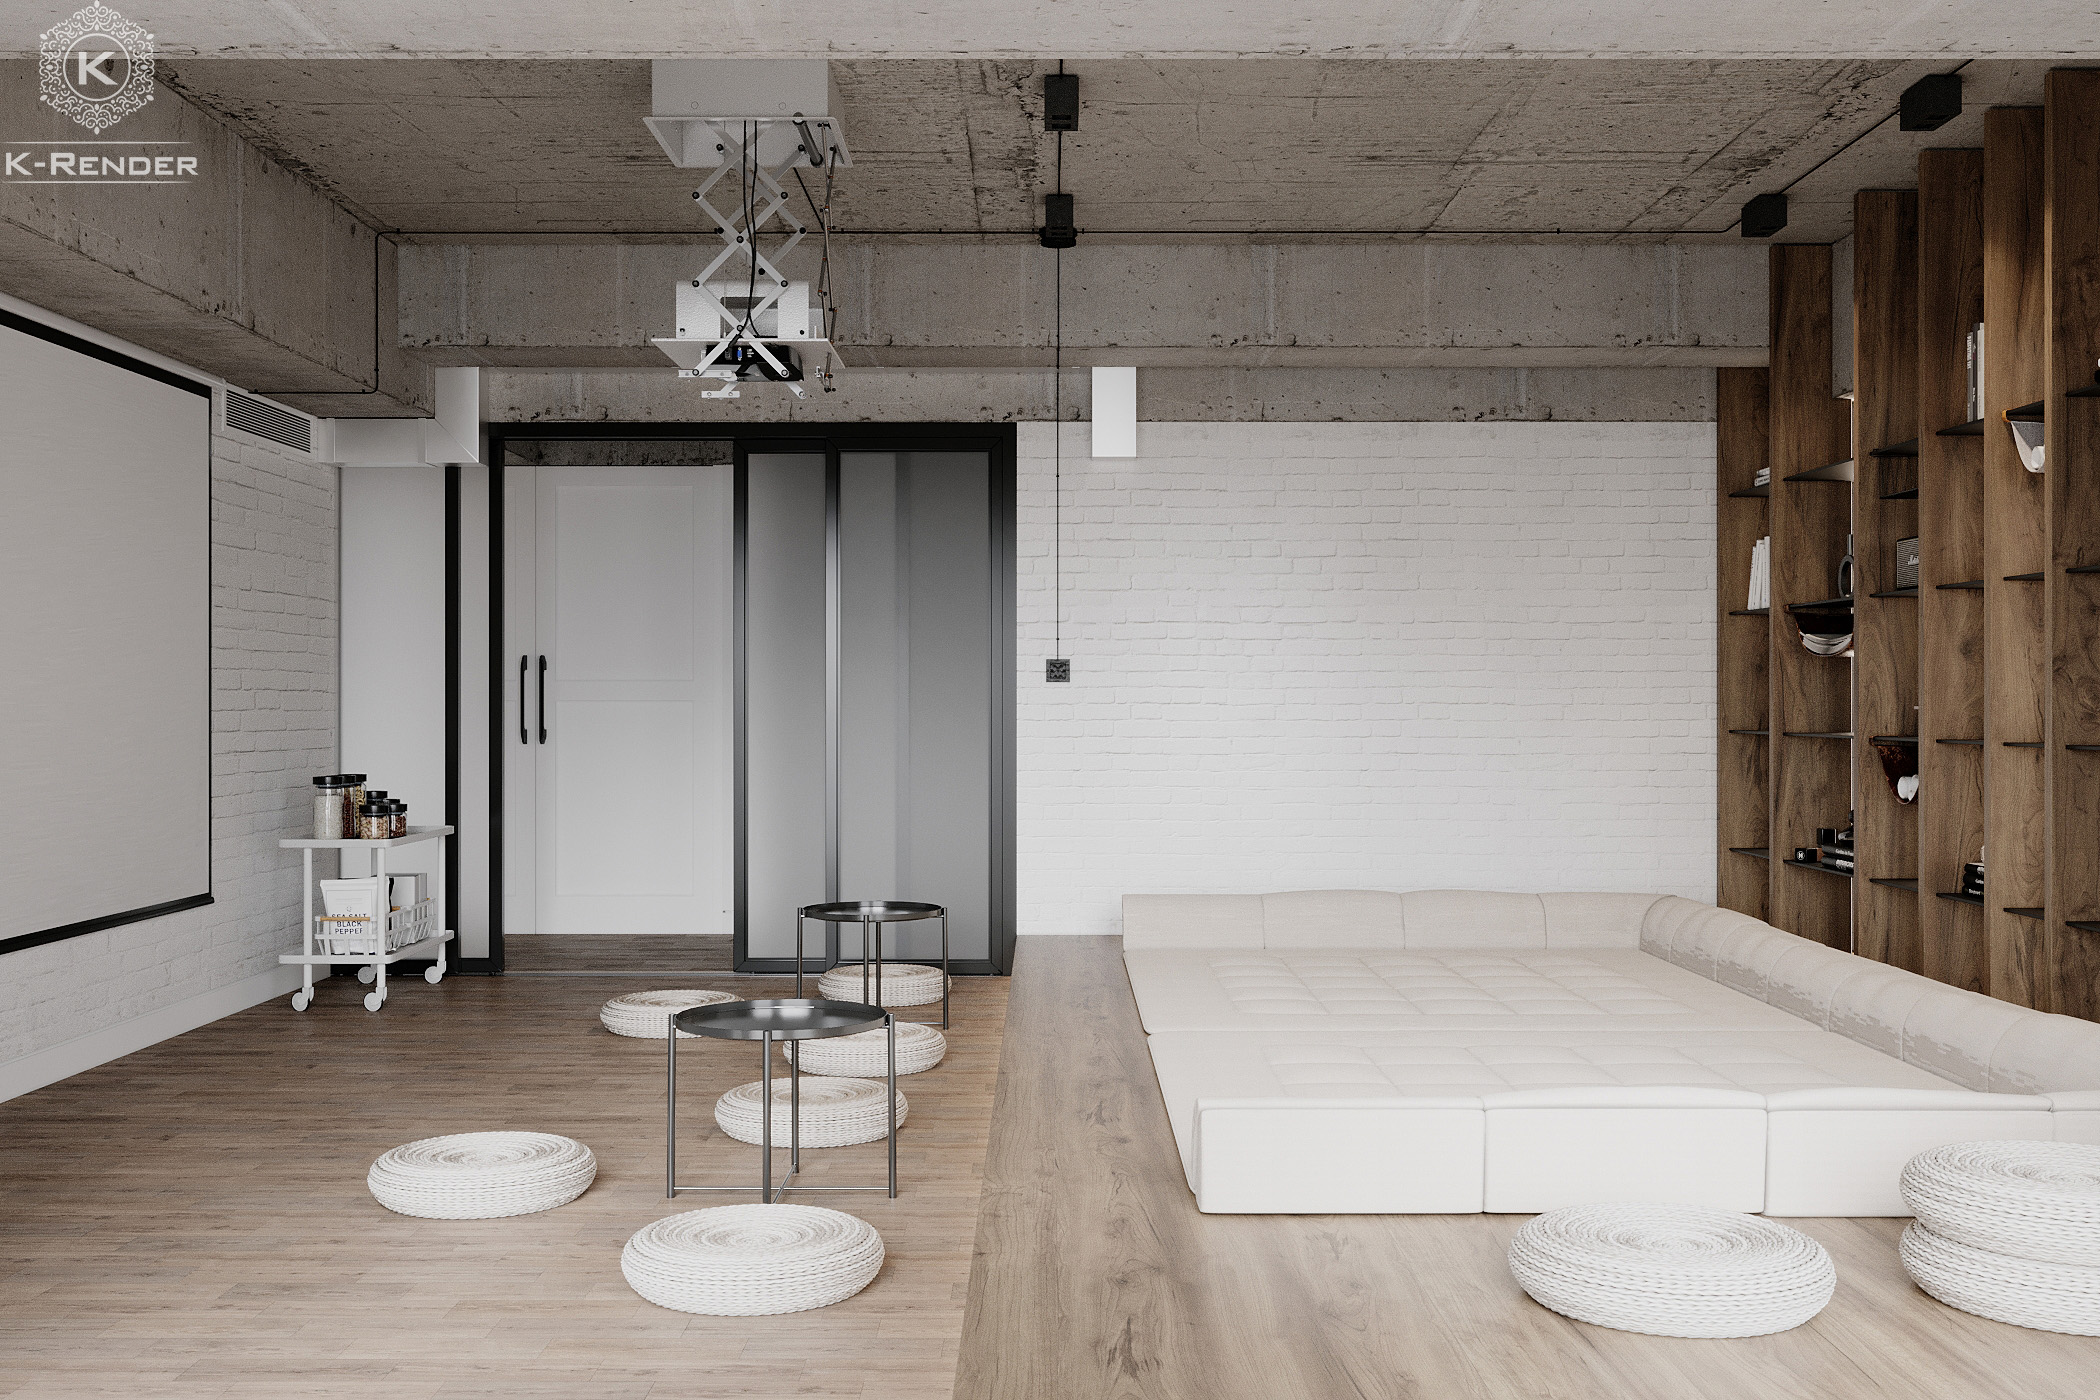 sunshine-apartment-k-render-studio-3d-rendering-studio-6